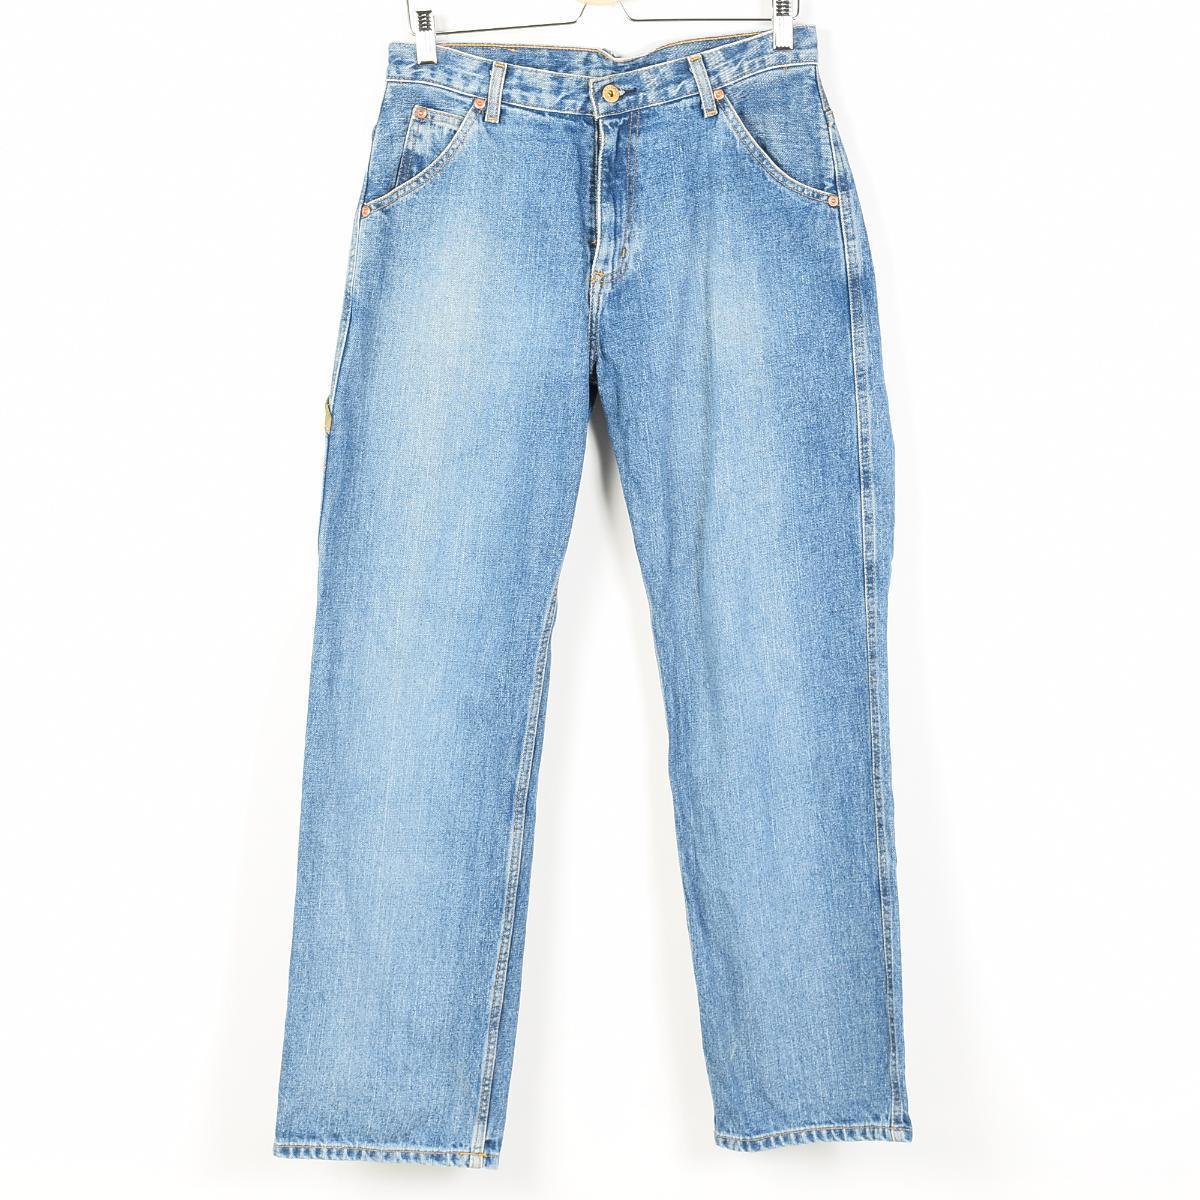 Mens Jeans 29 X 29